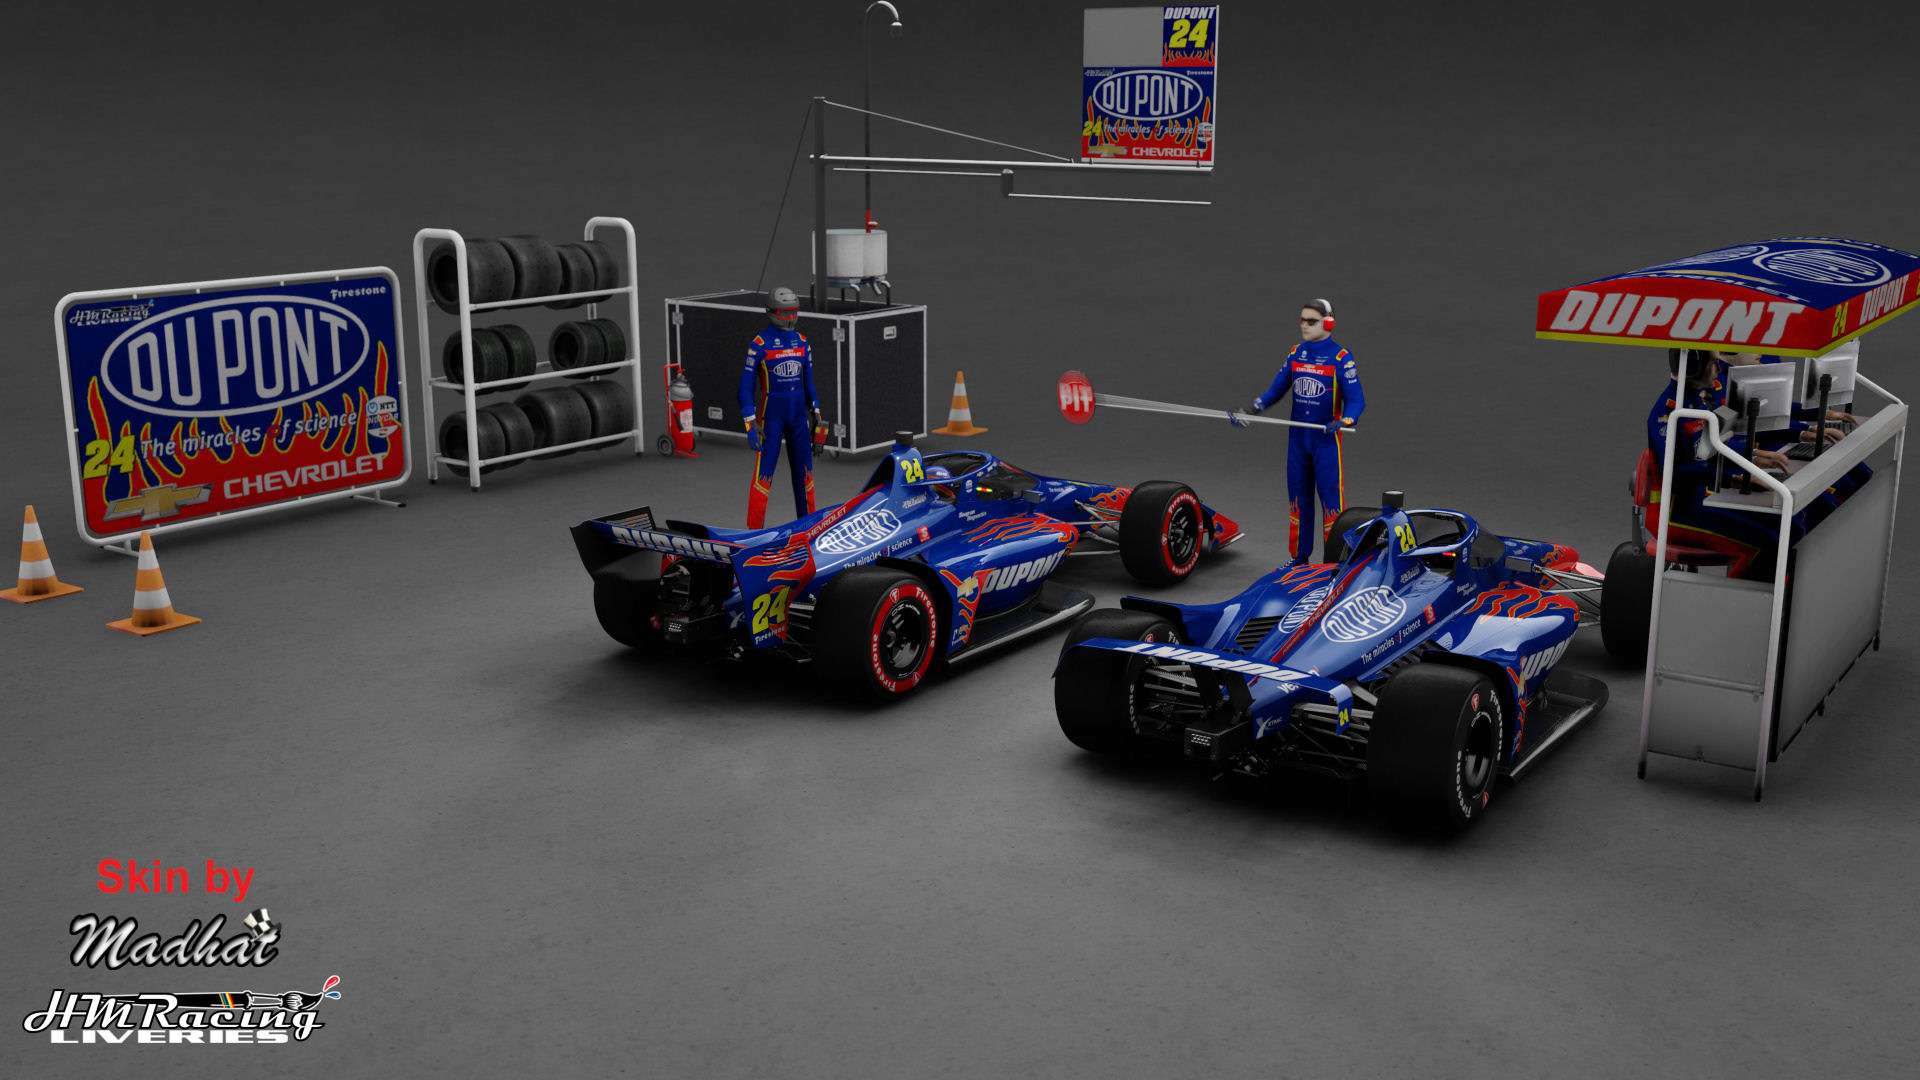 DU PONT Jeff Gordon 24 IndyCar Madhat HMRacing Liveries 03.jpg